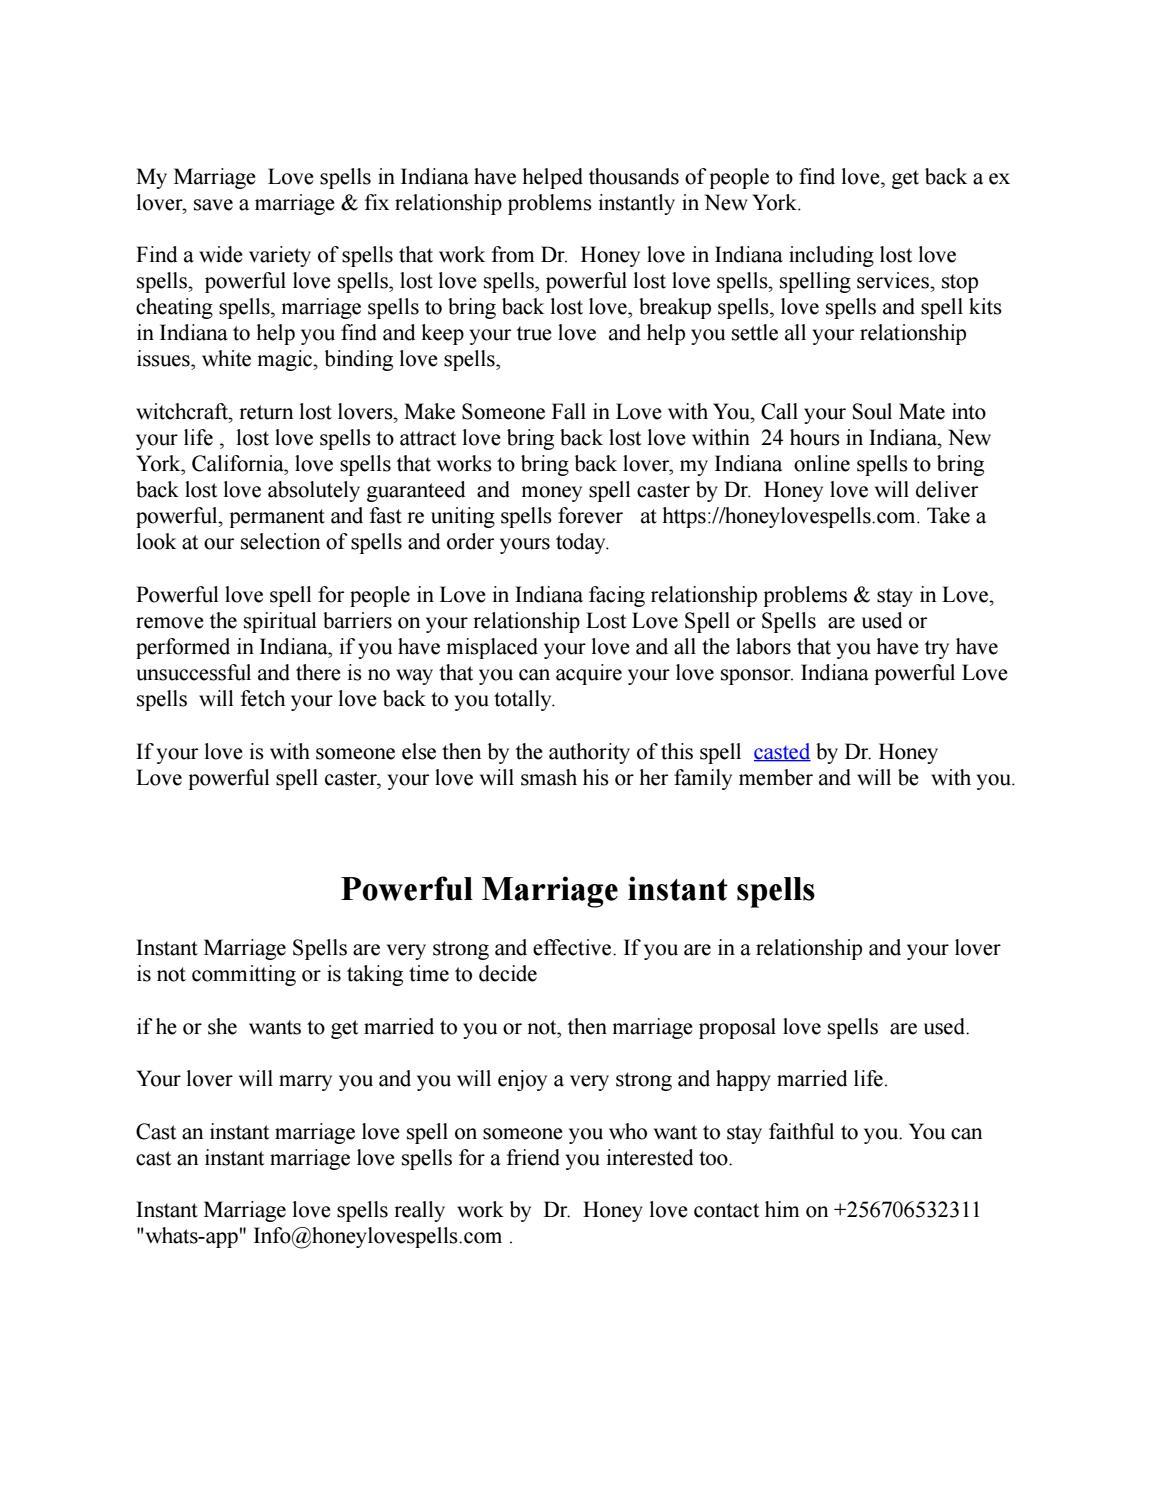 BEST MARRIAGE SPELLS by honey2lovespells - issuu